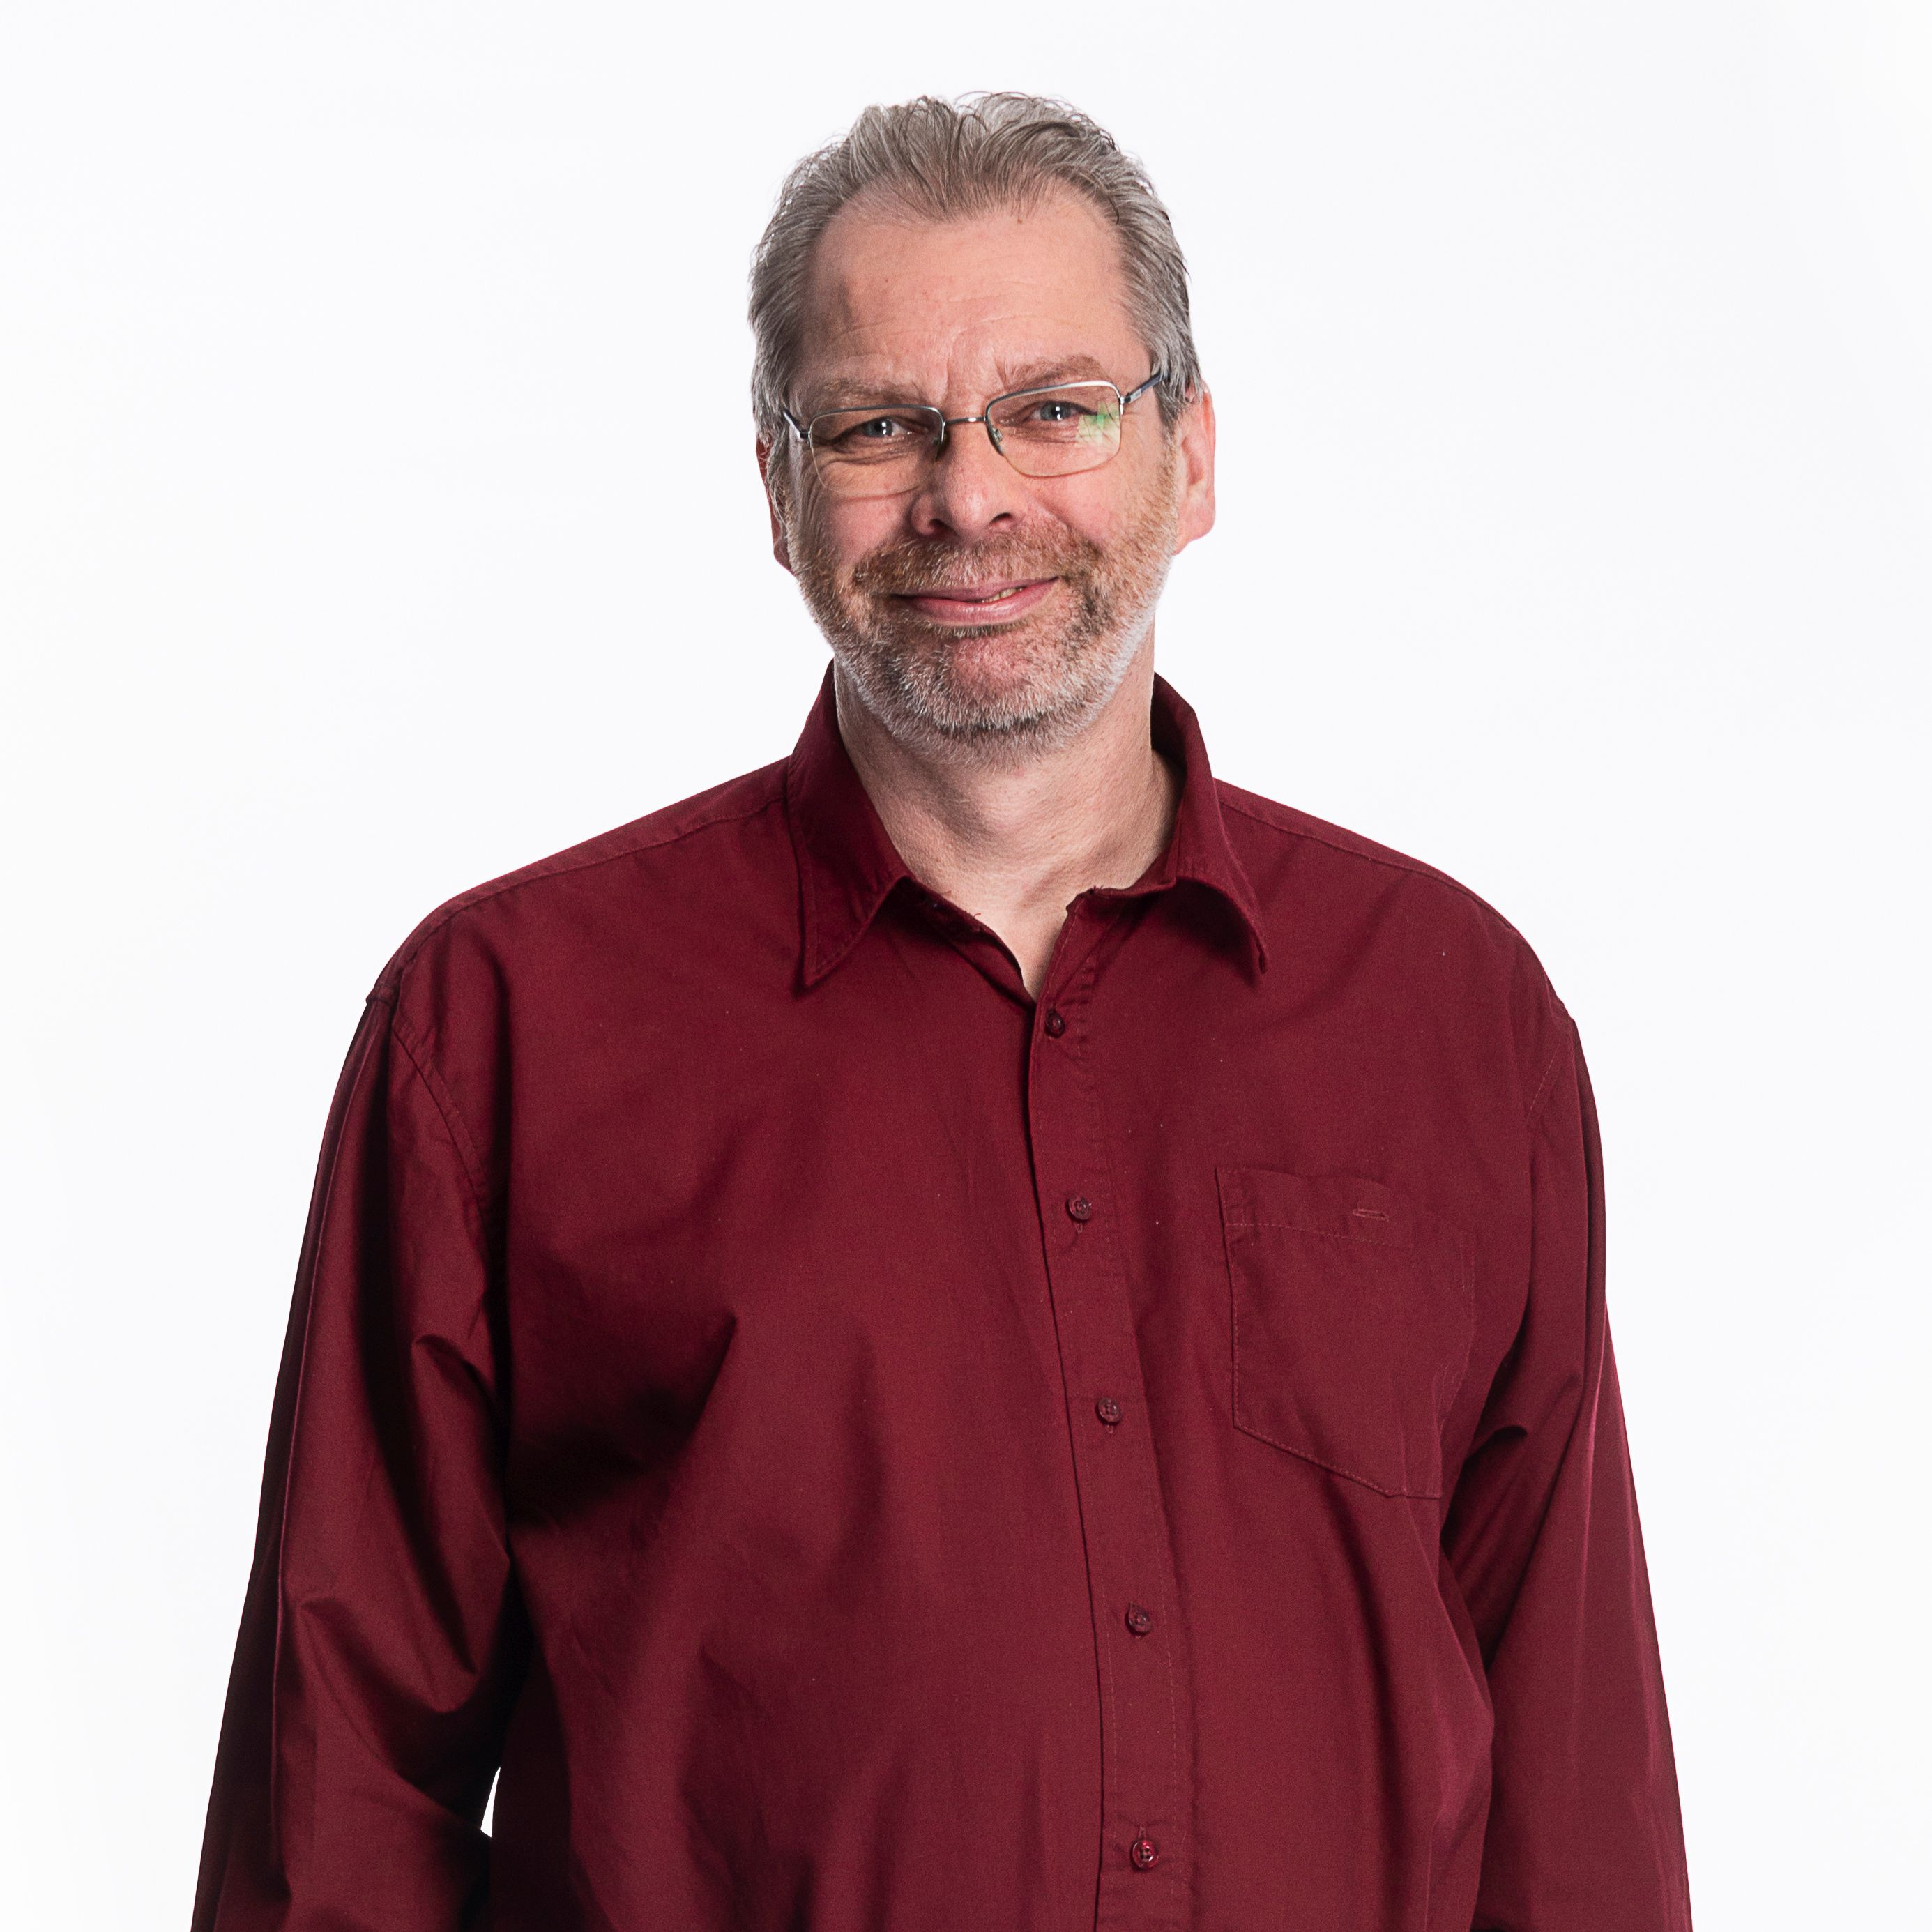 Ralf Draeger, dynaMigs.net